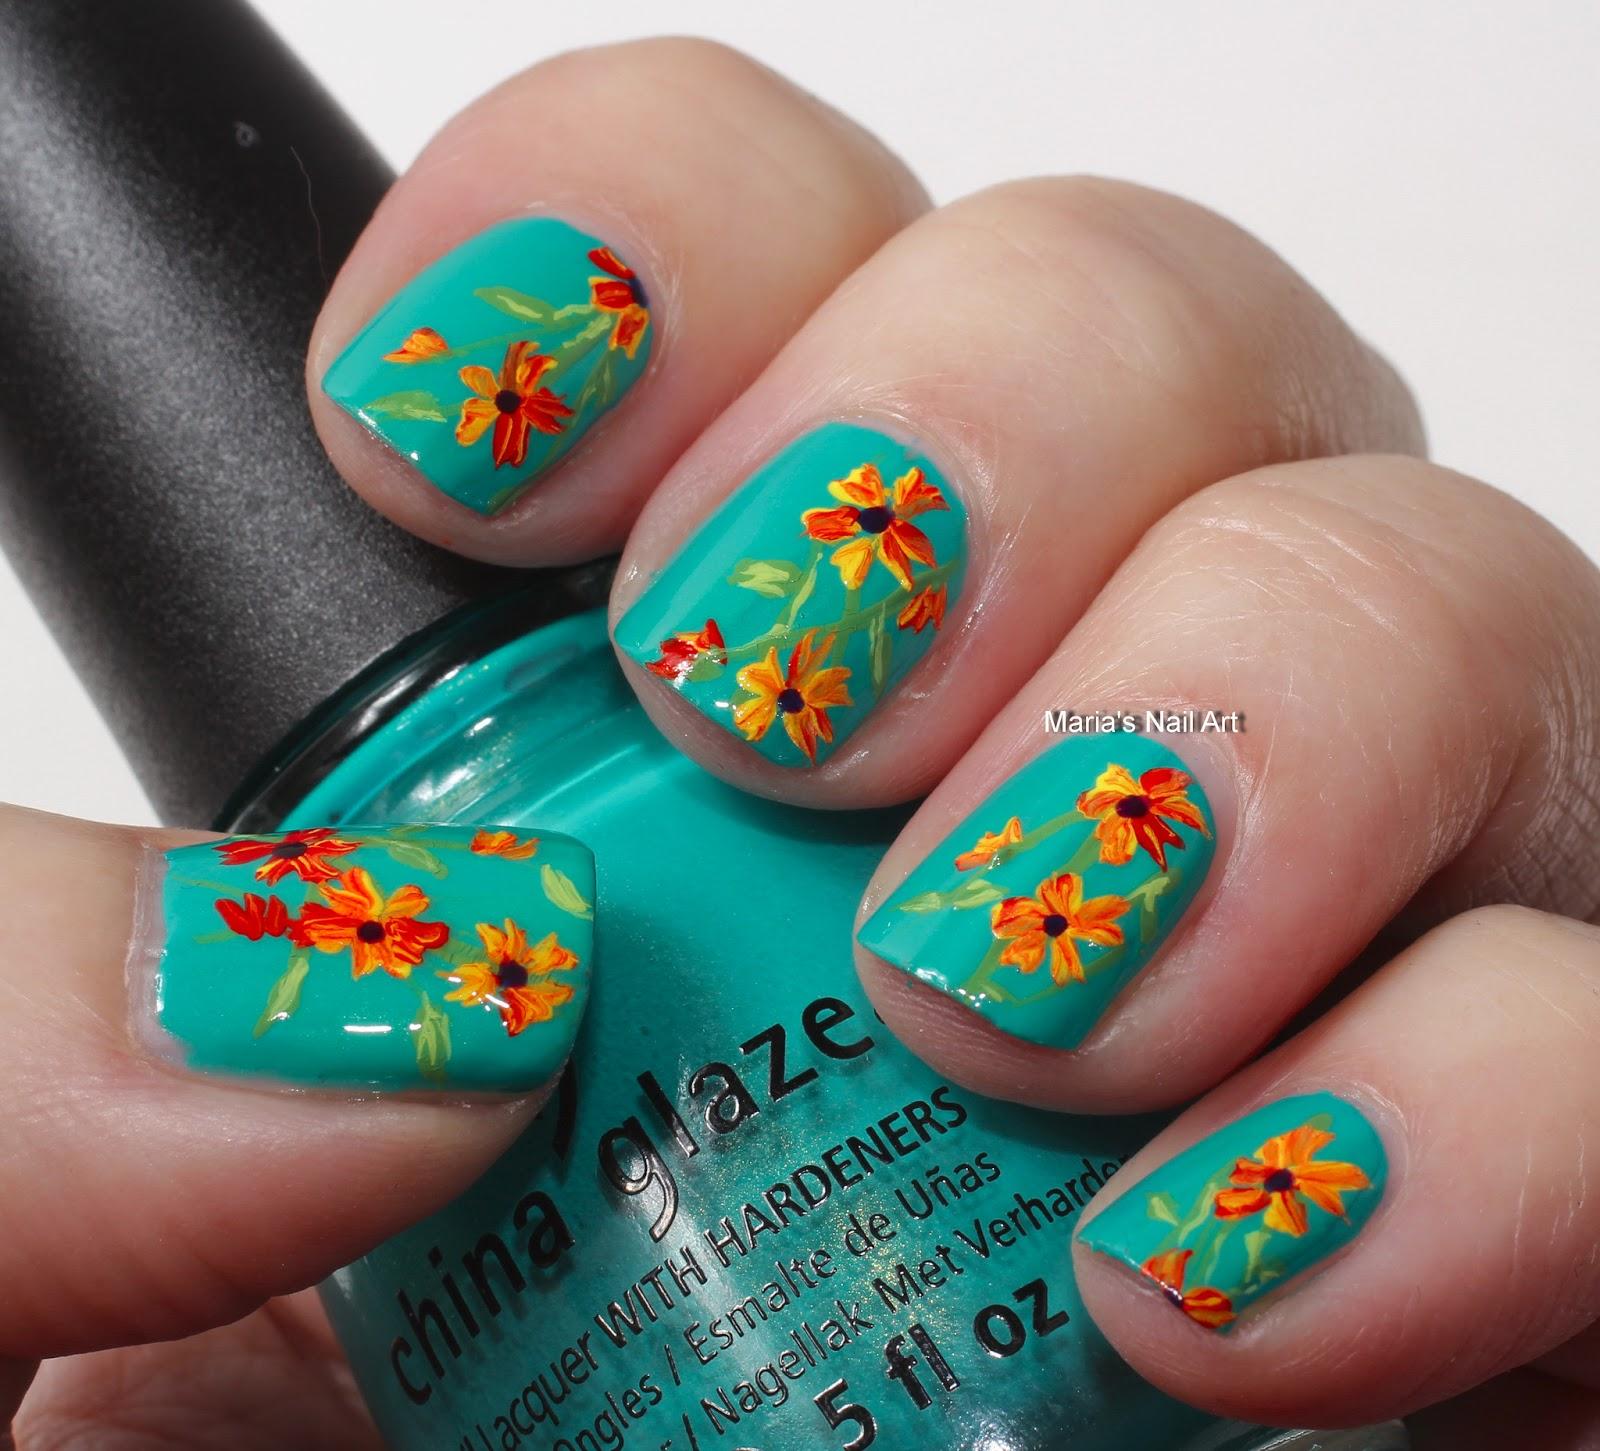 Marias Nail Art And Polish Blog: Flowers On Custom Kicks